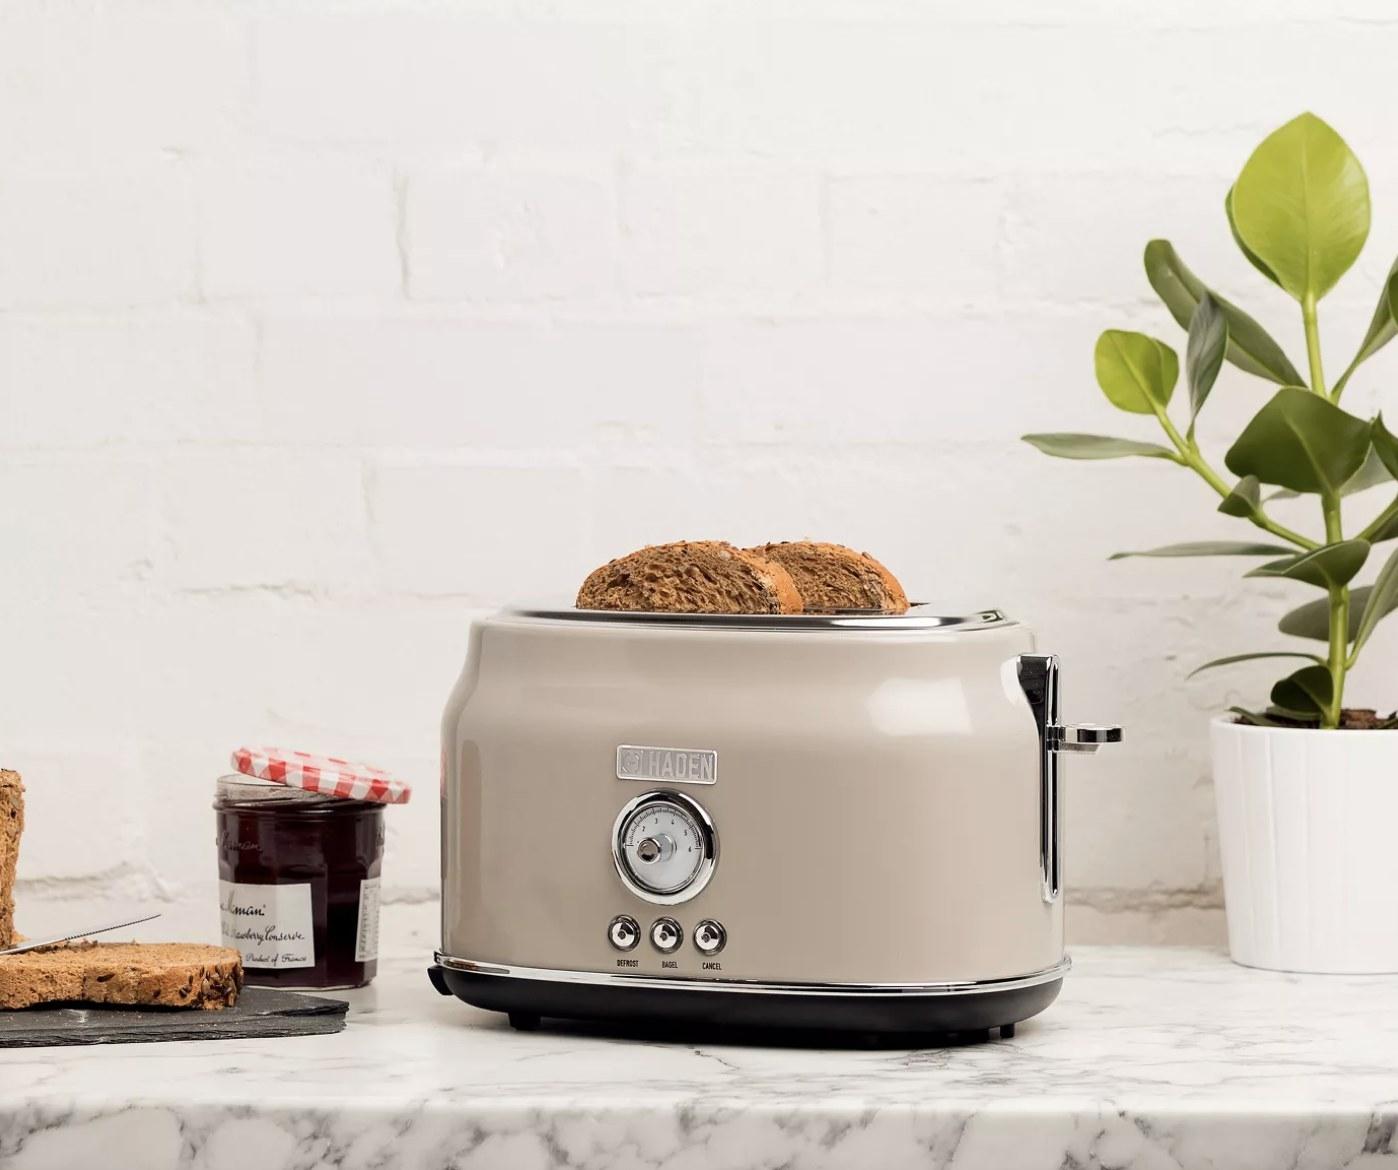 The beige retro toaster